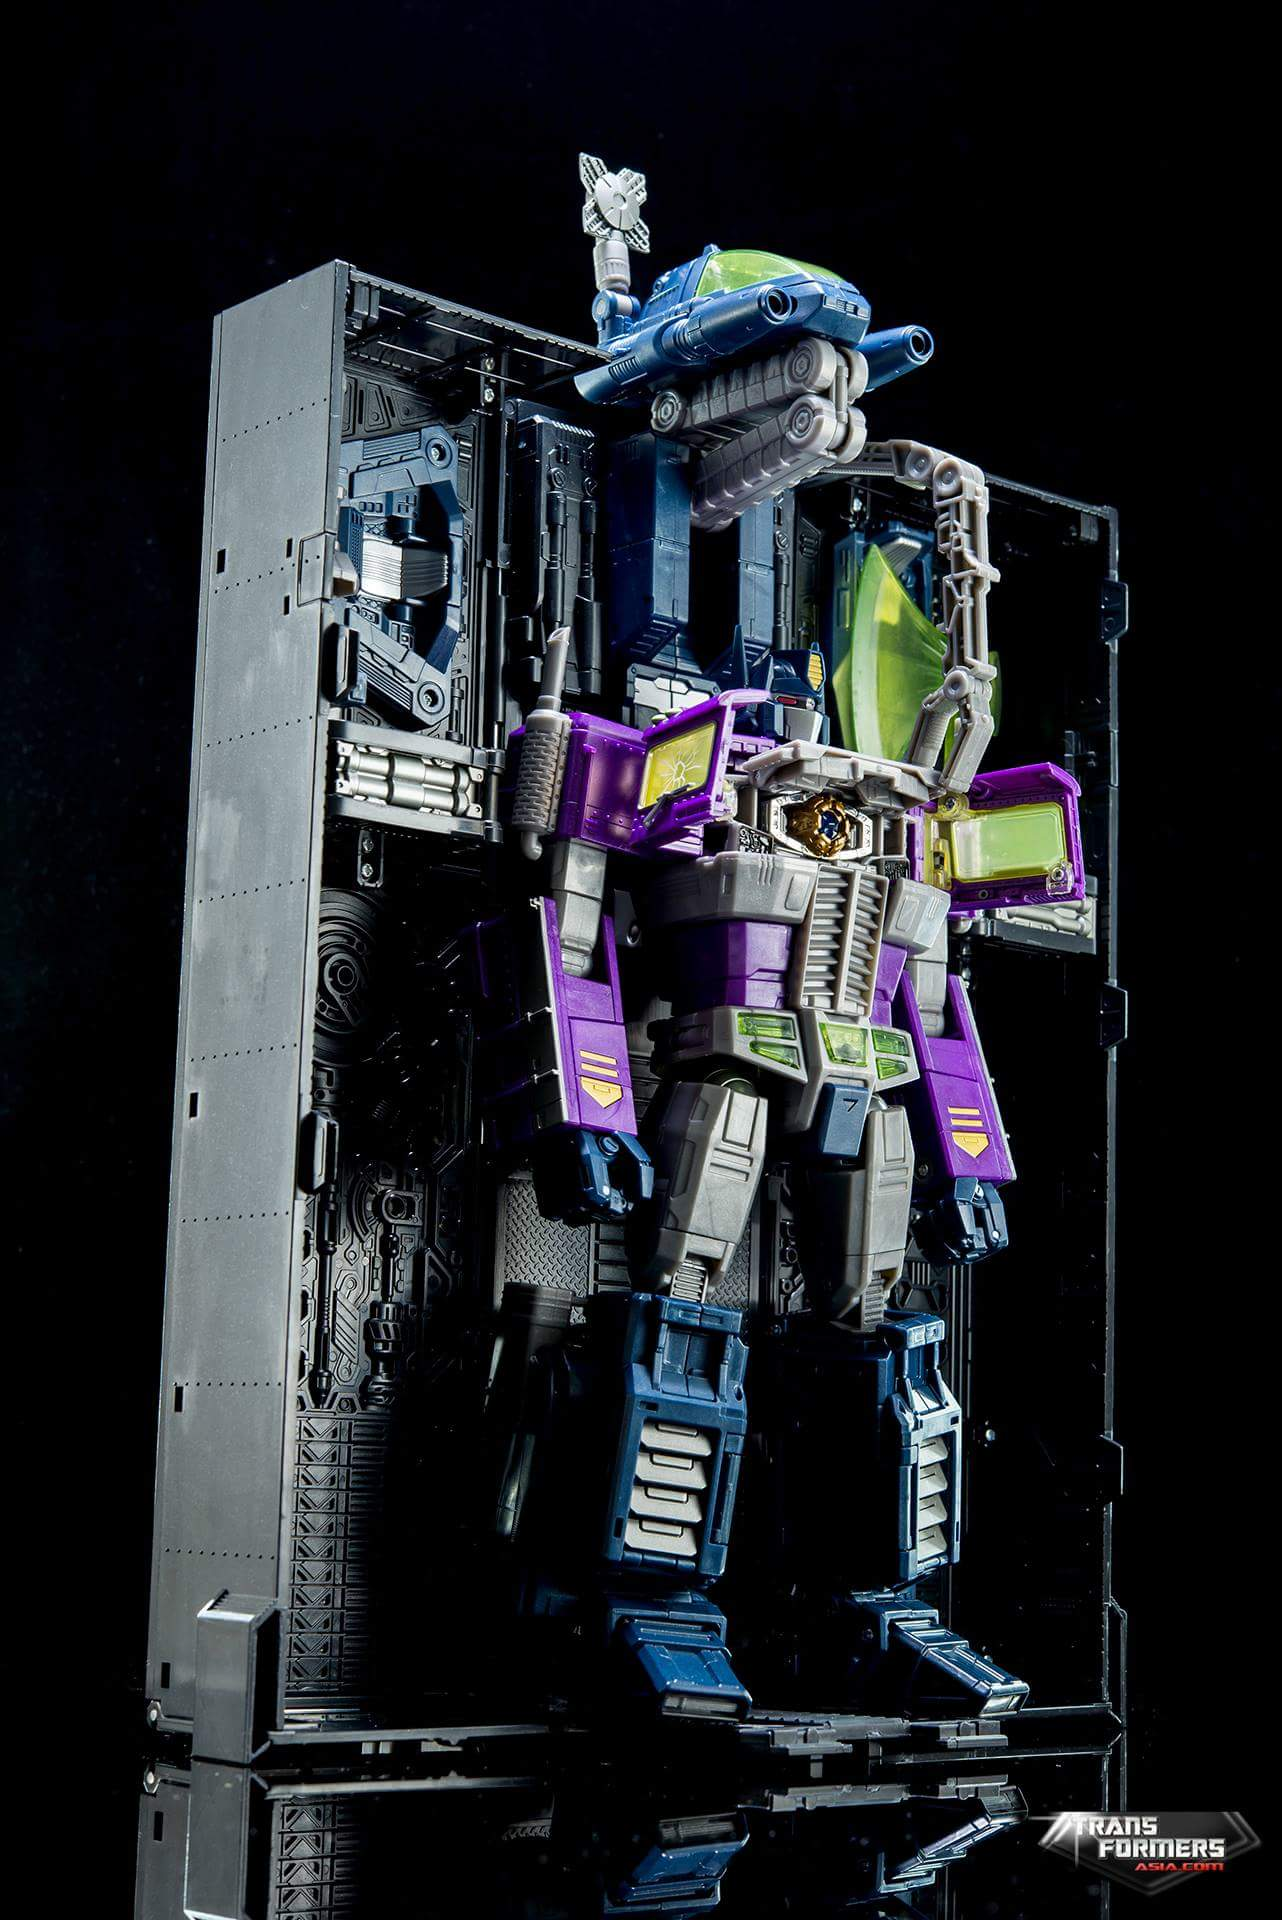 [Masterpiece] MP-10B   MP-10A   MP-10R   MP-10SG   MP-10K   MP-711   MP-10G   MP-10 ASL ― Convoy (Optimus Prime/Optimus Primus) - Page 4 YHvmn8GR